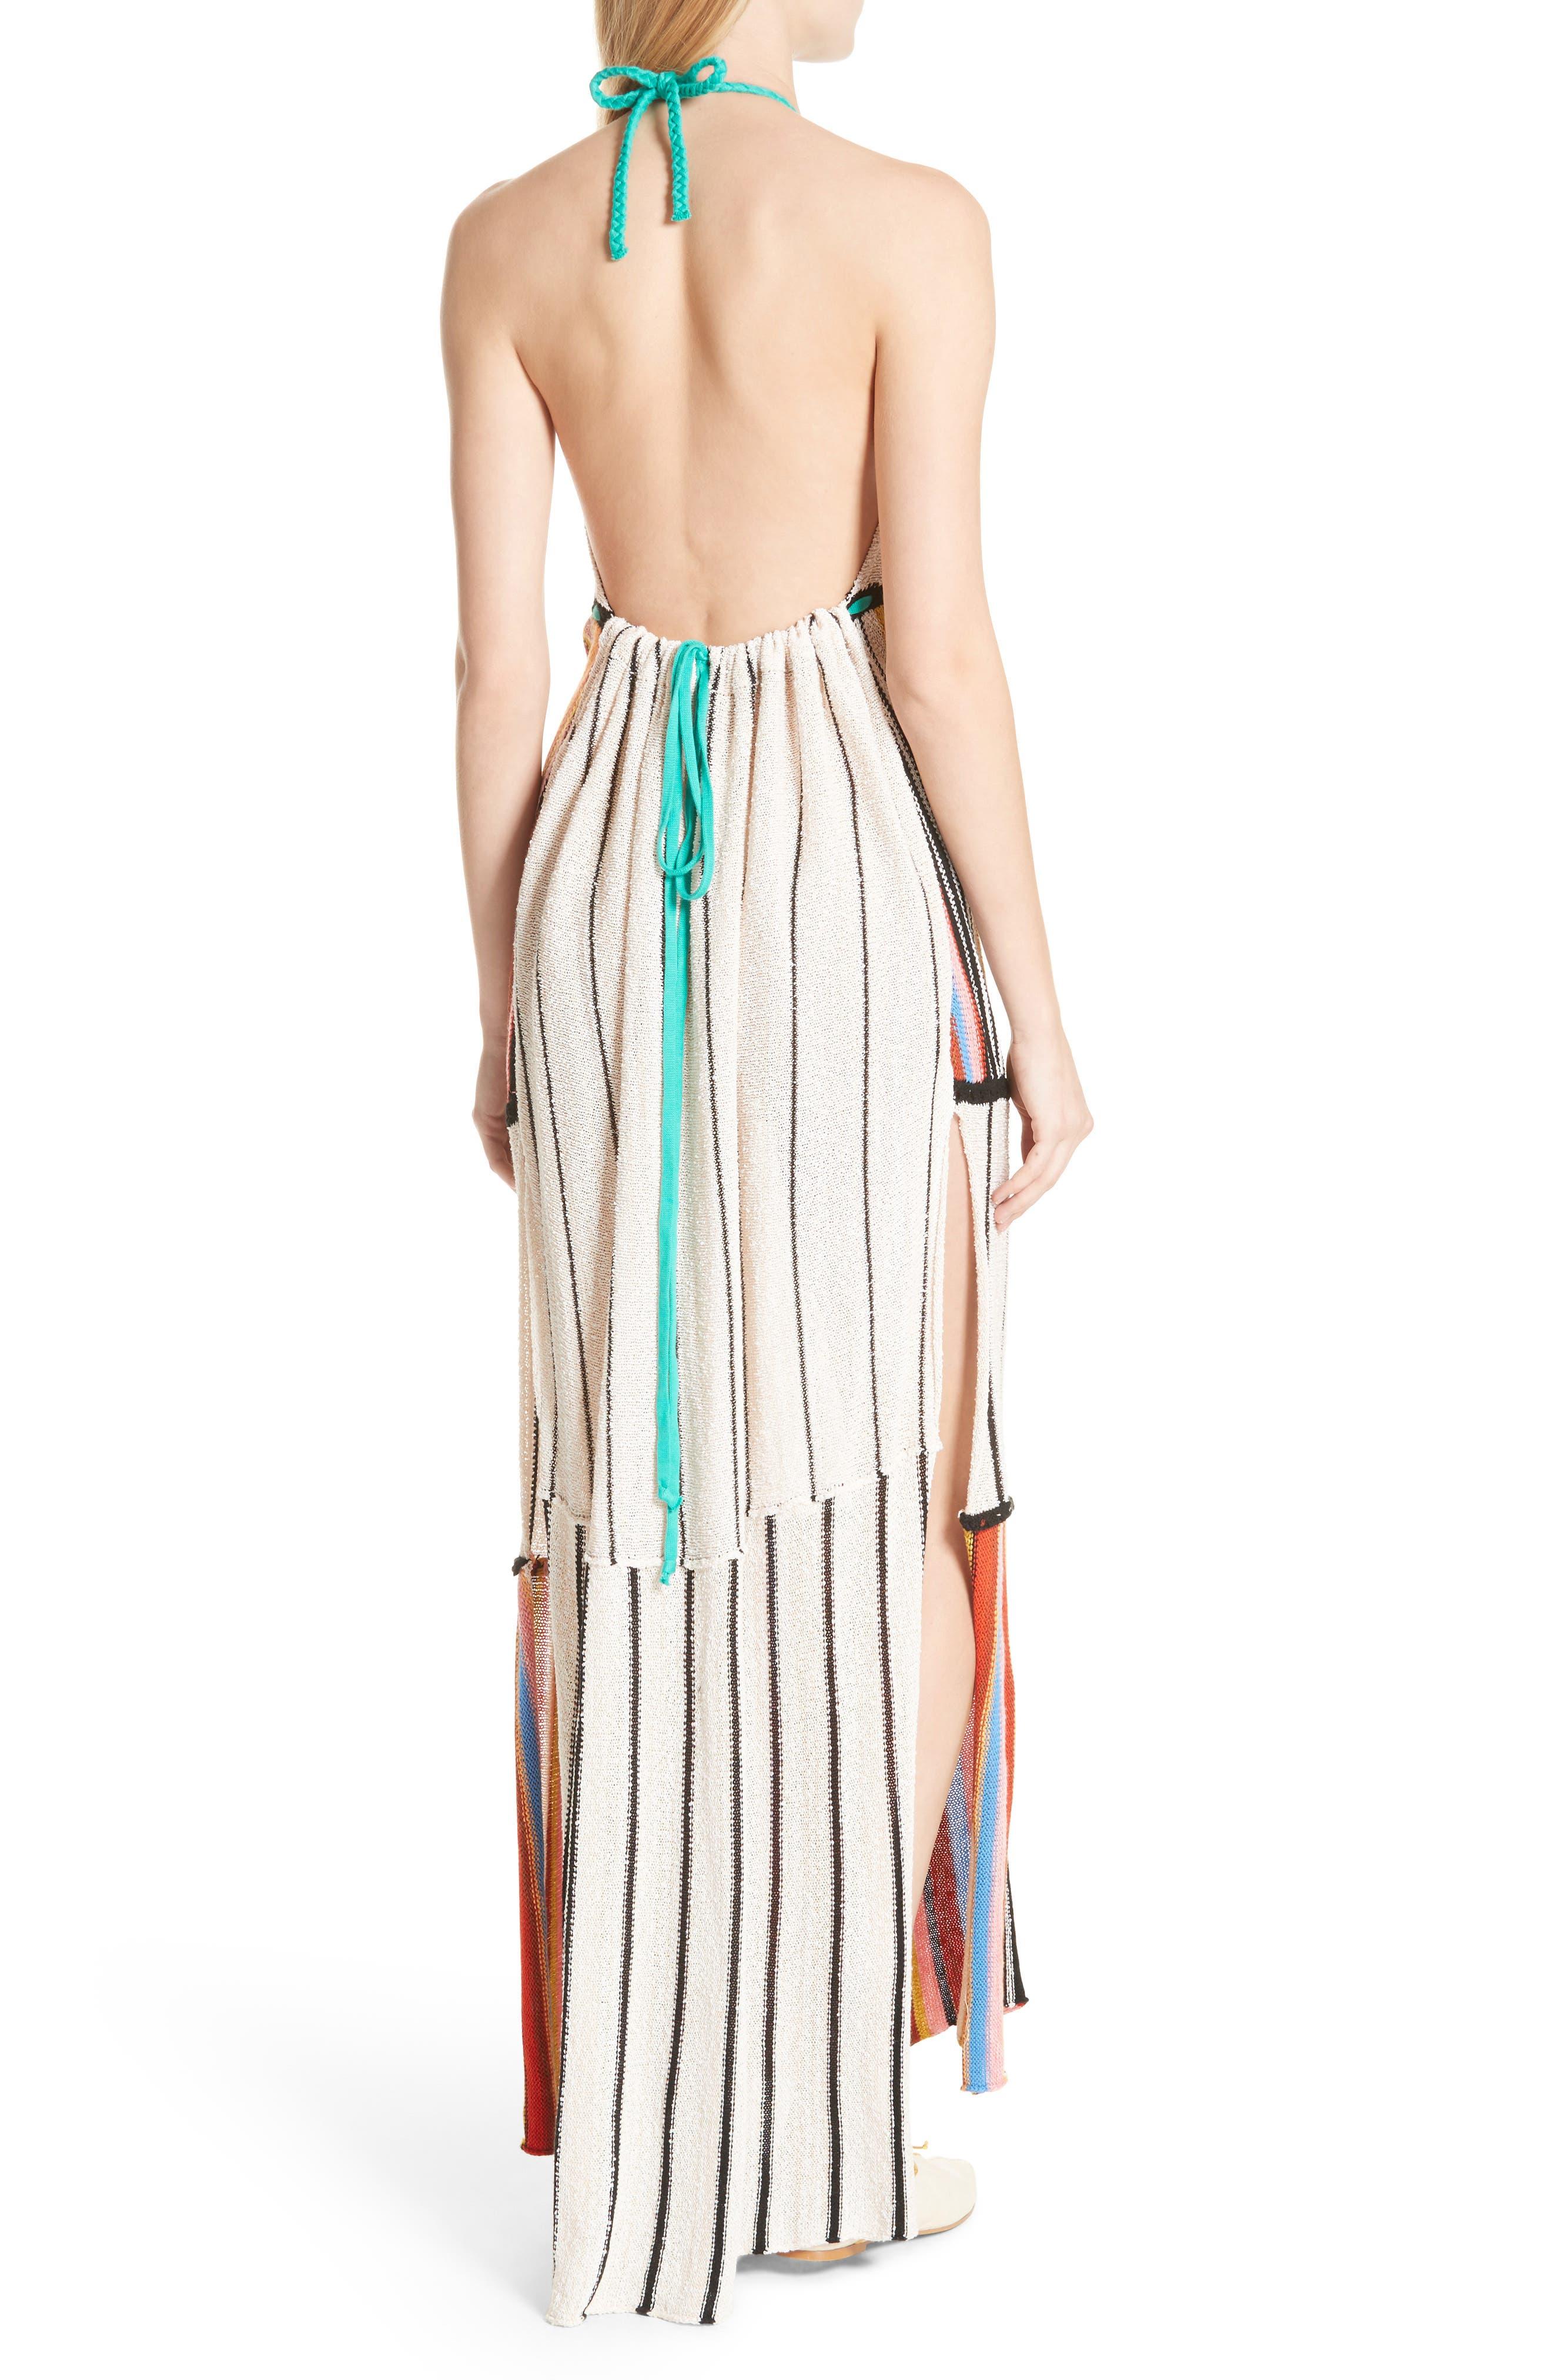 Mardi Gras Halter Maxi Dress,                             Alternate thumbnail 4, color,